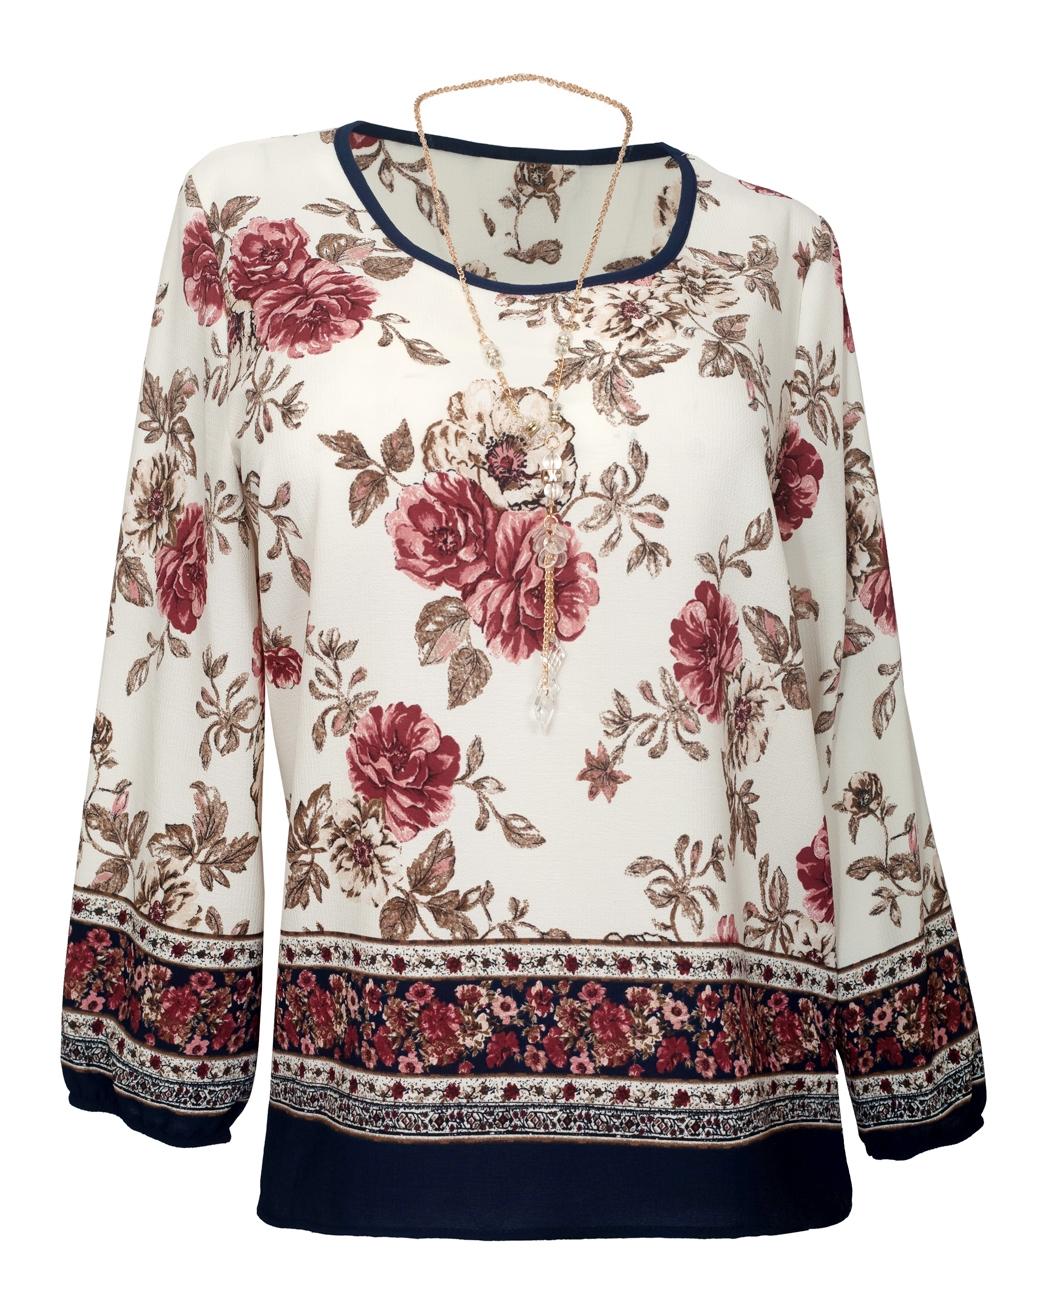 6e348107a Plus Size Long Sleeve Top White Floral Print | eVogues Apparel